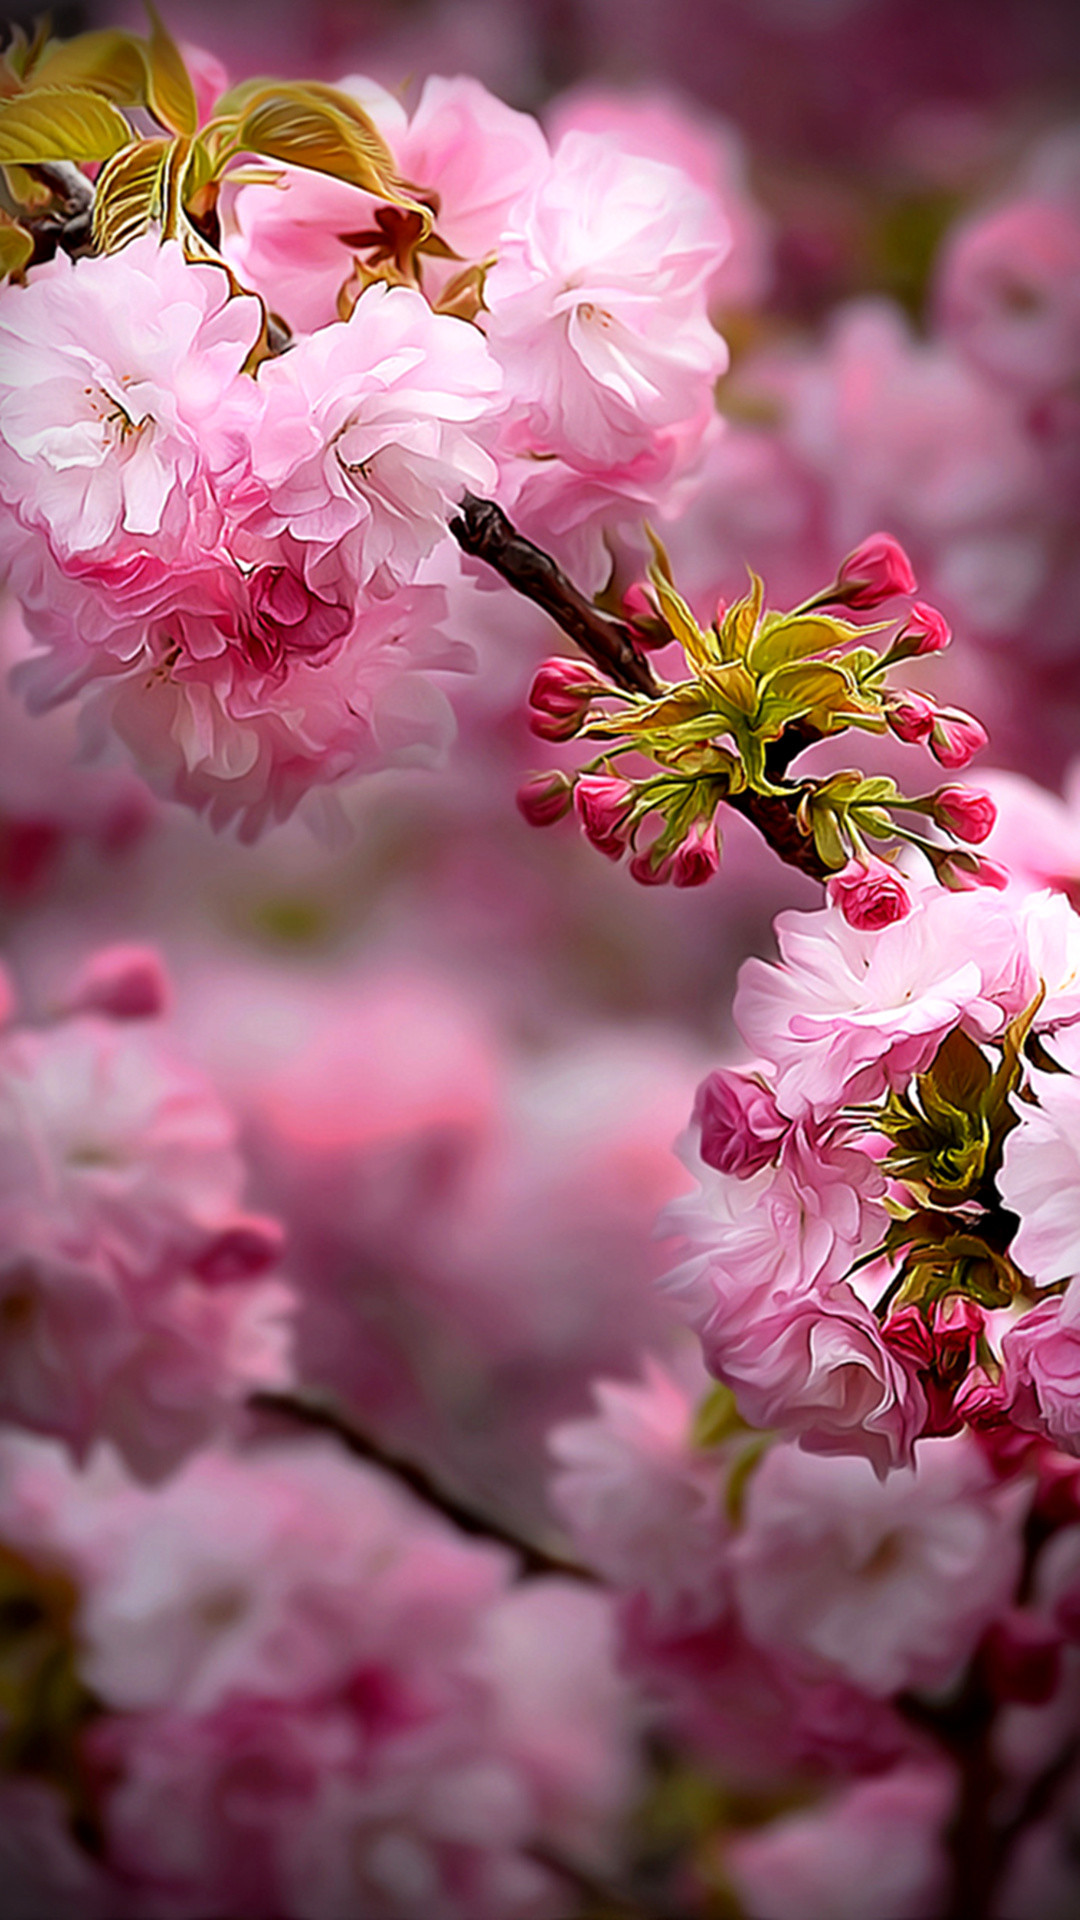 https://www.vactualpapers.com/gallery/spring-flowers-